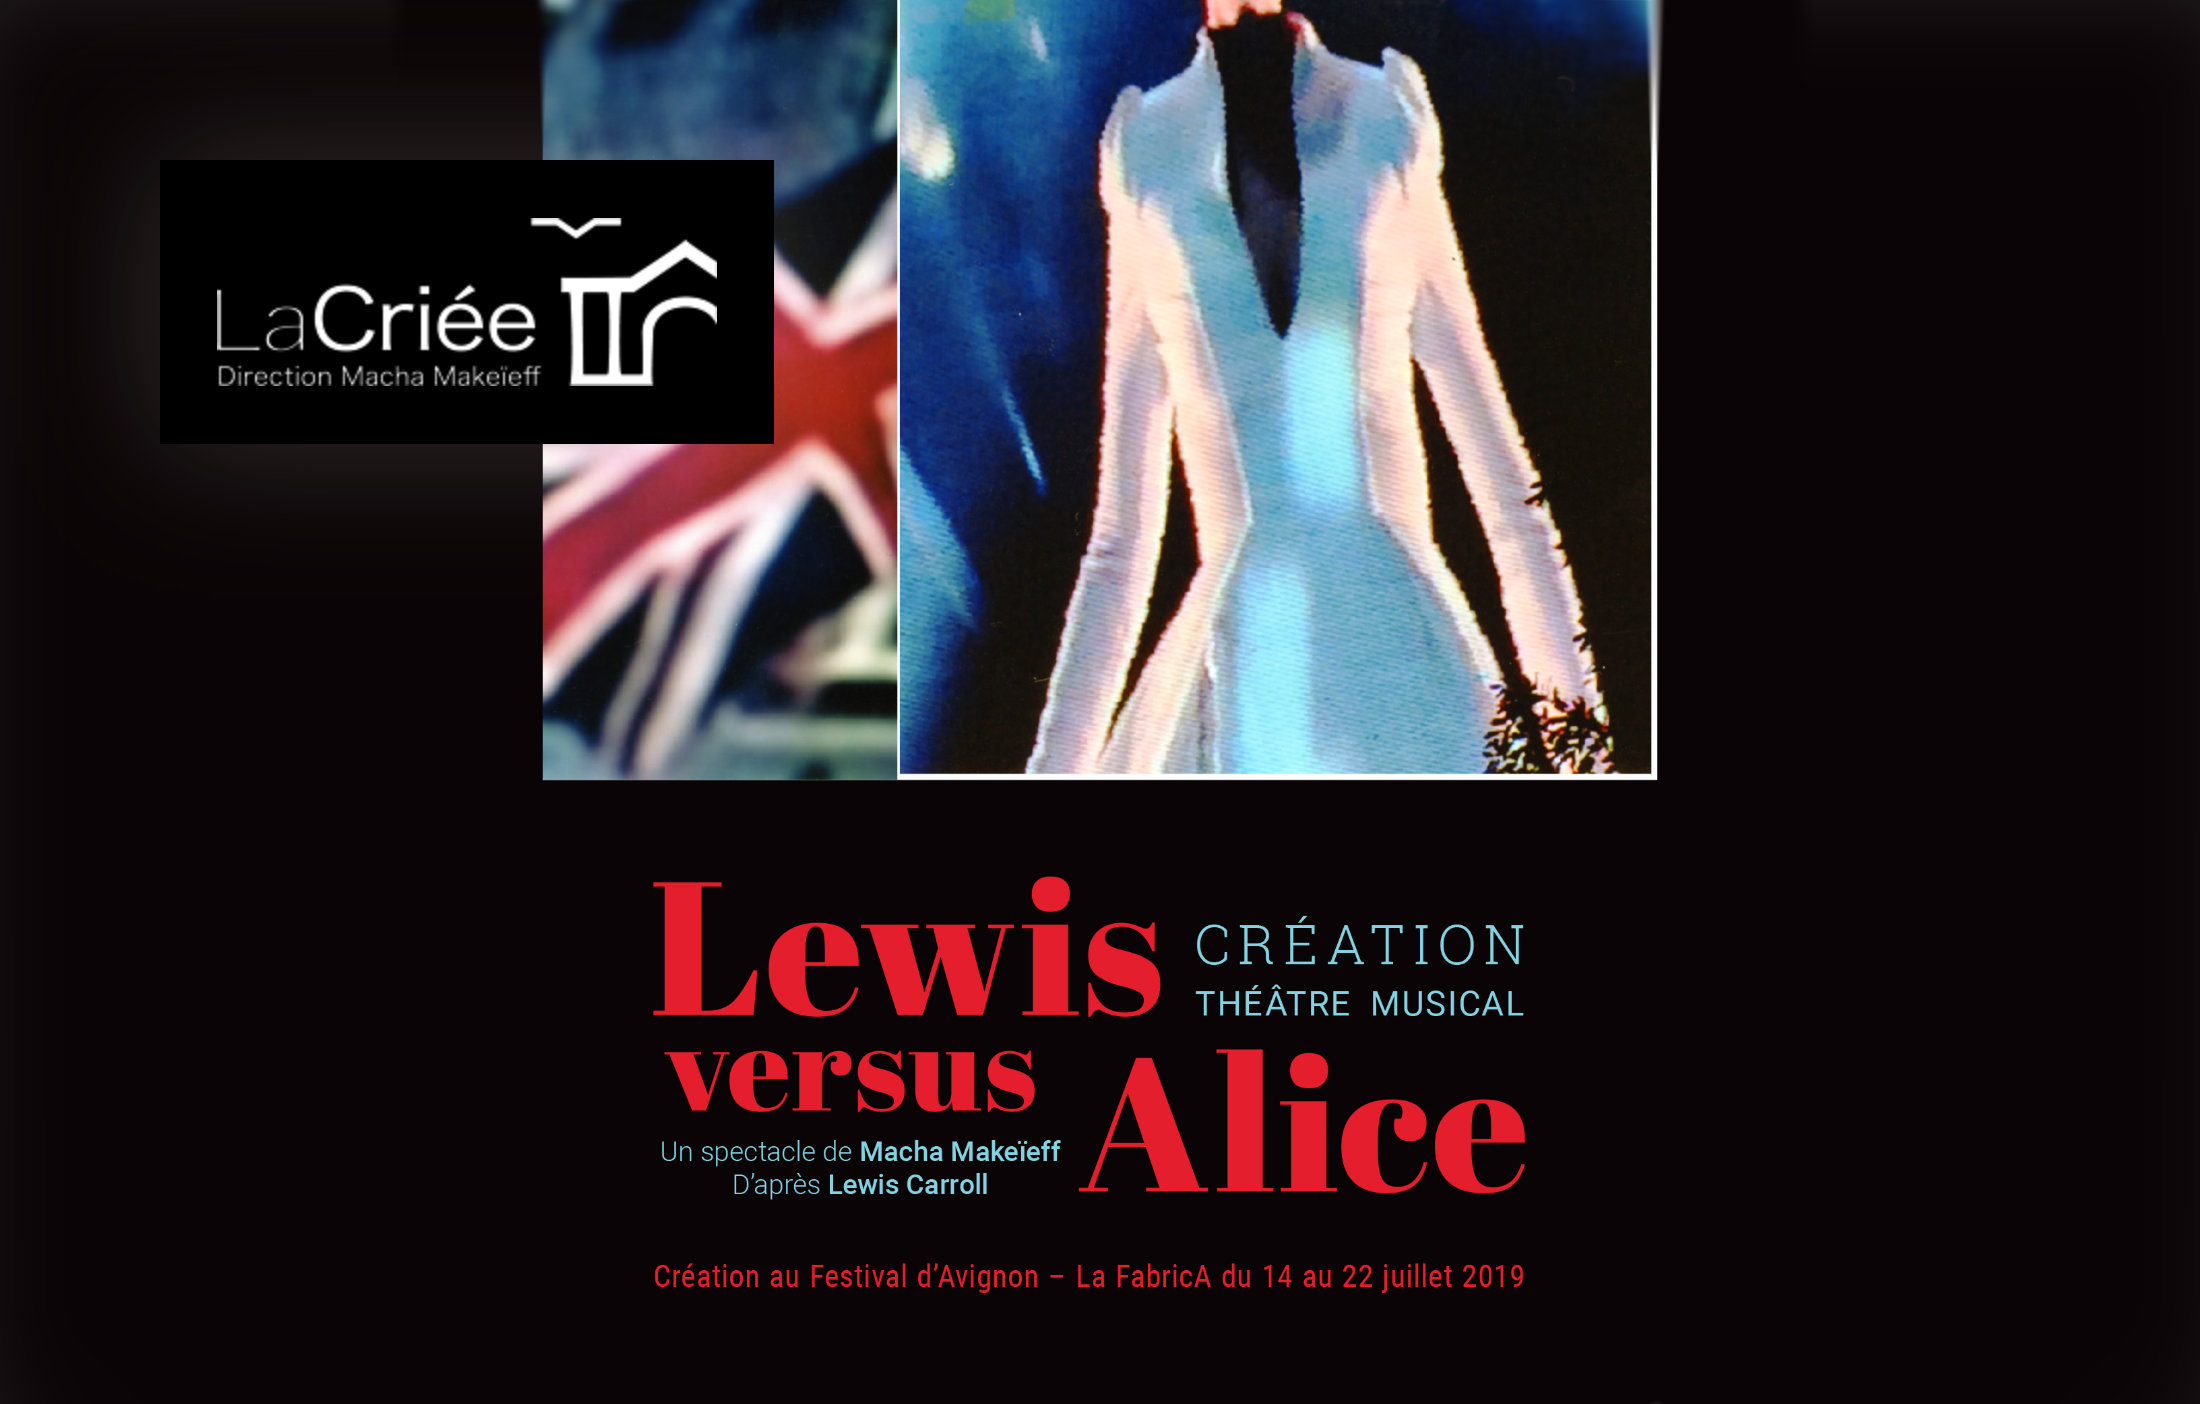 Lewis-versus-Alice-d-apres-Lewis-Carroll@2x